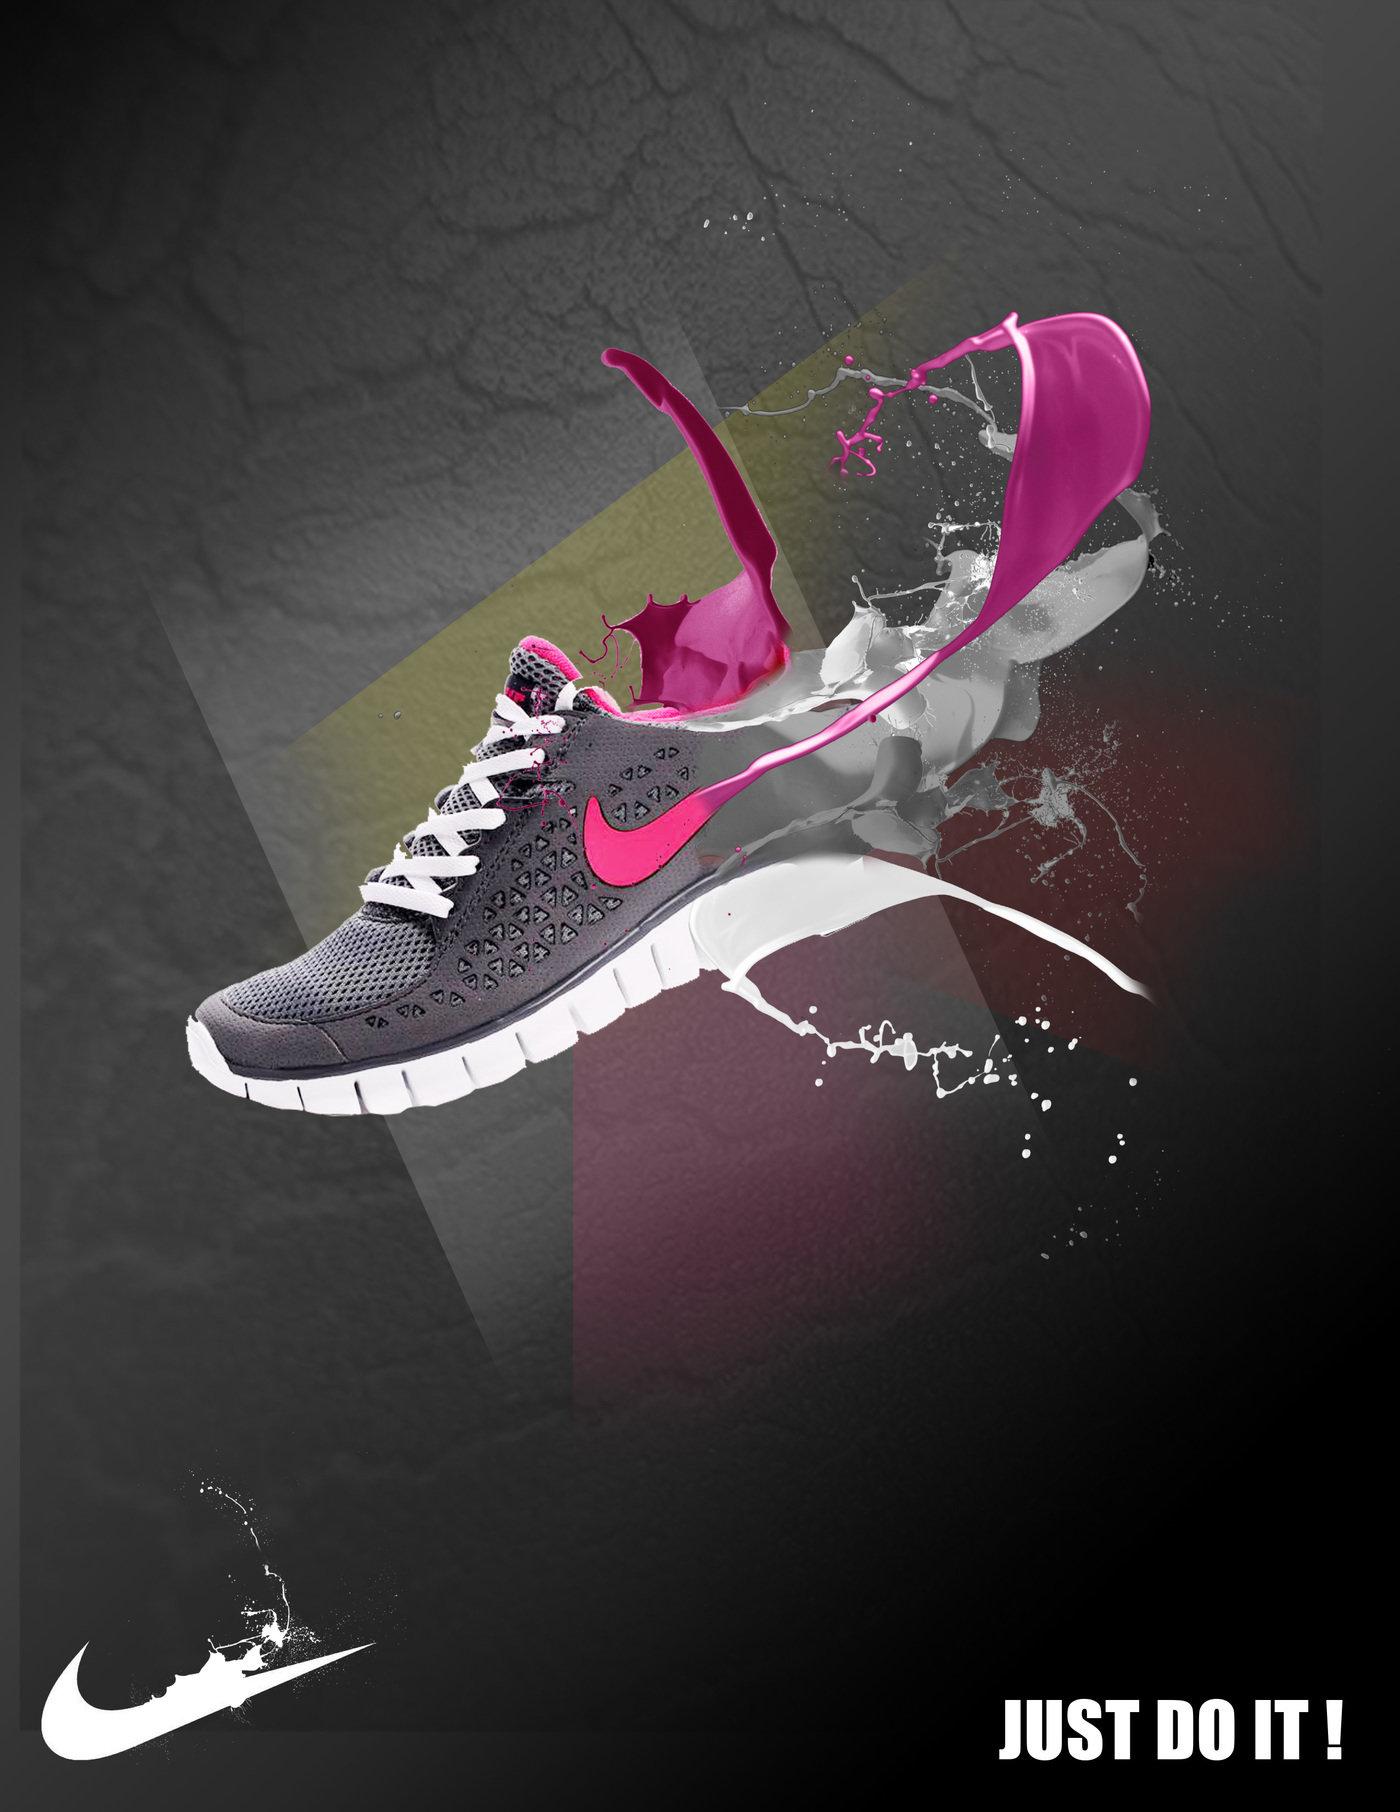 Nike Ad Campaigns By Manuel Izurieta At Coroflot Com